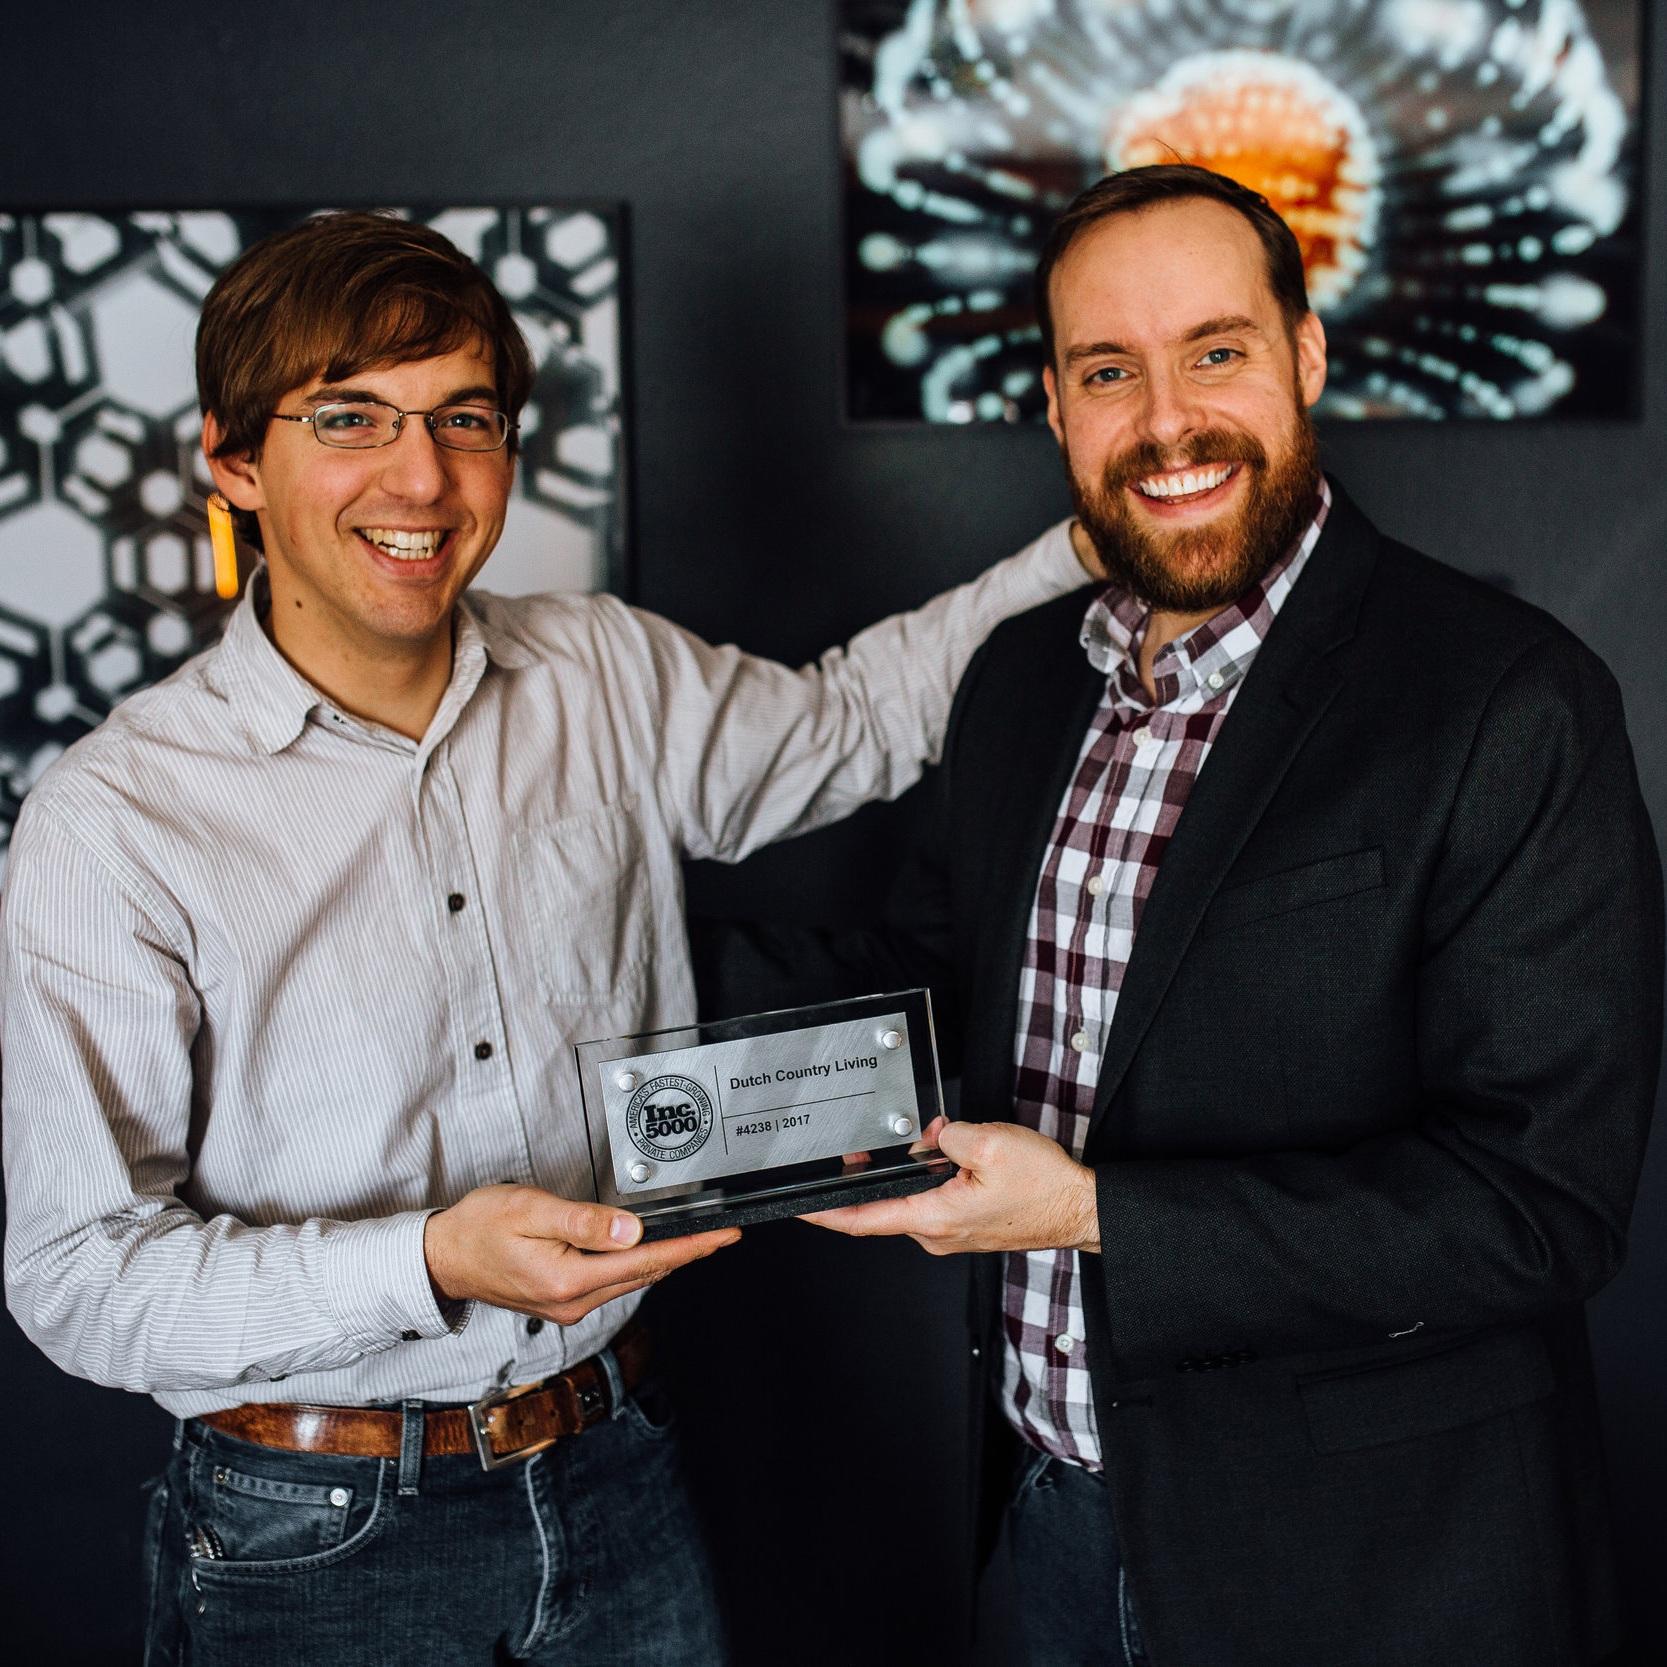 Levi Good Inc5000 Award